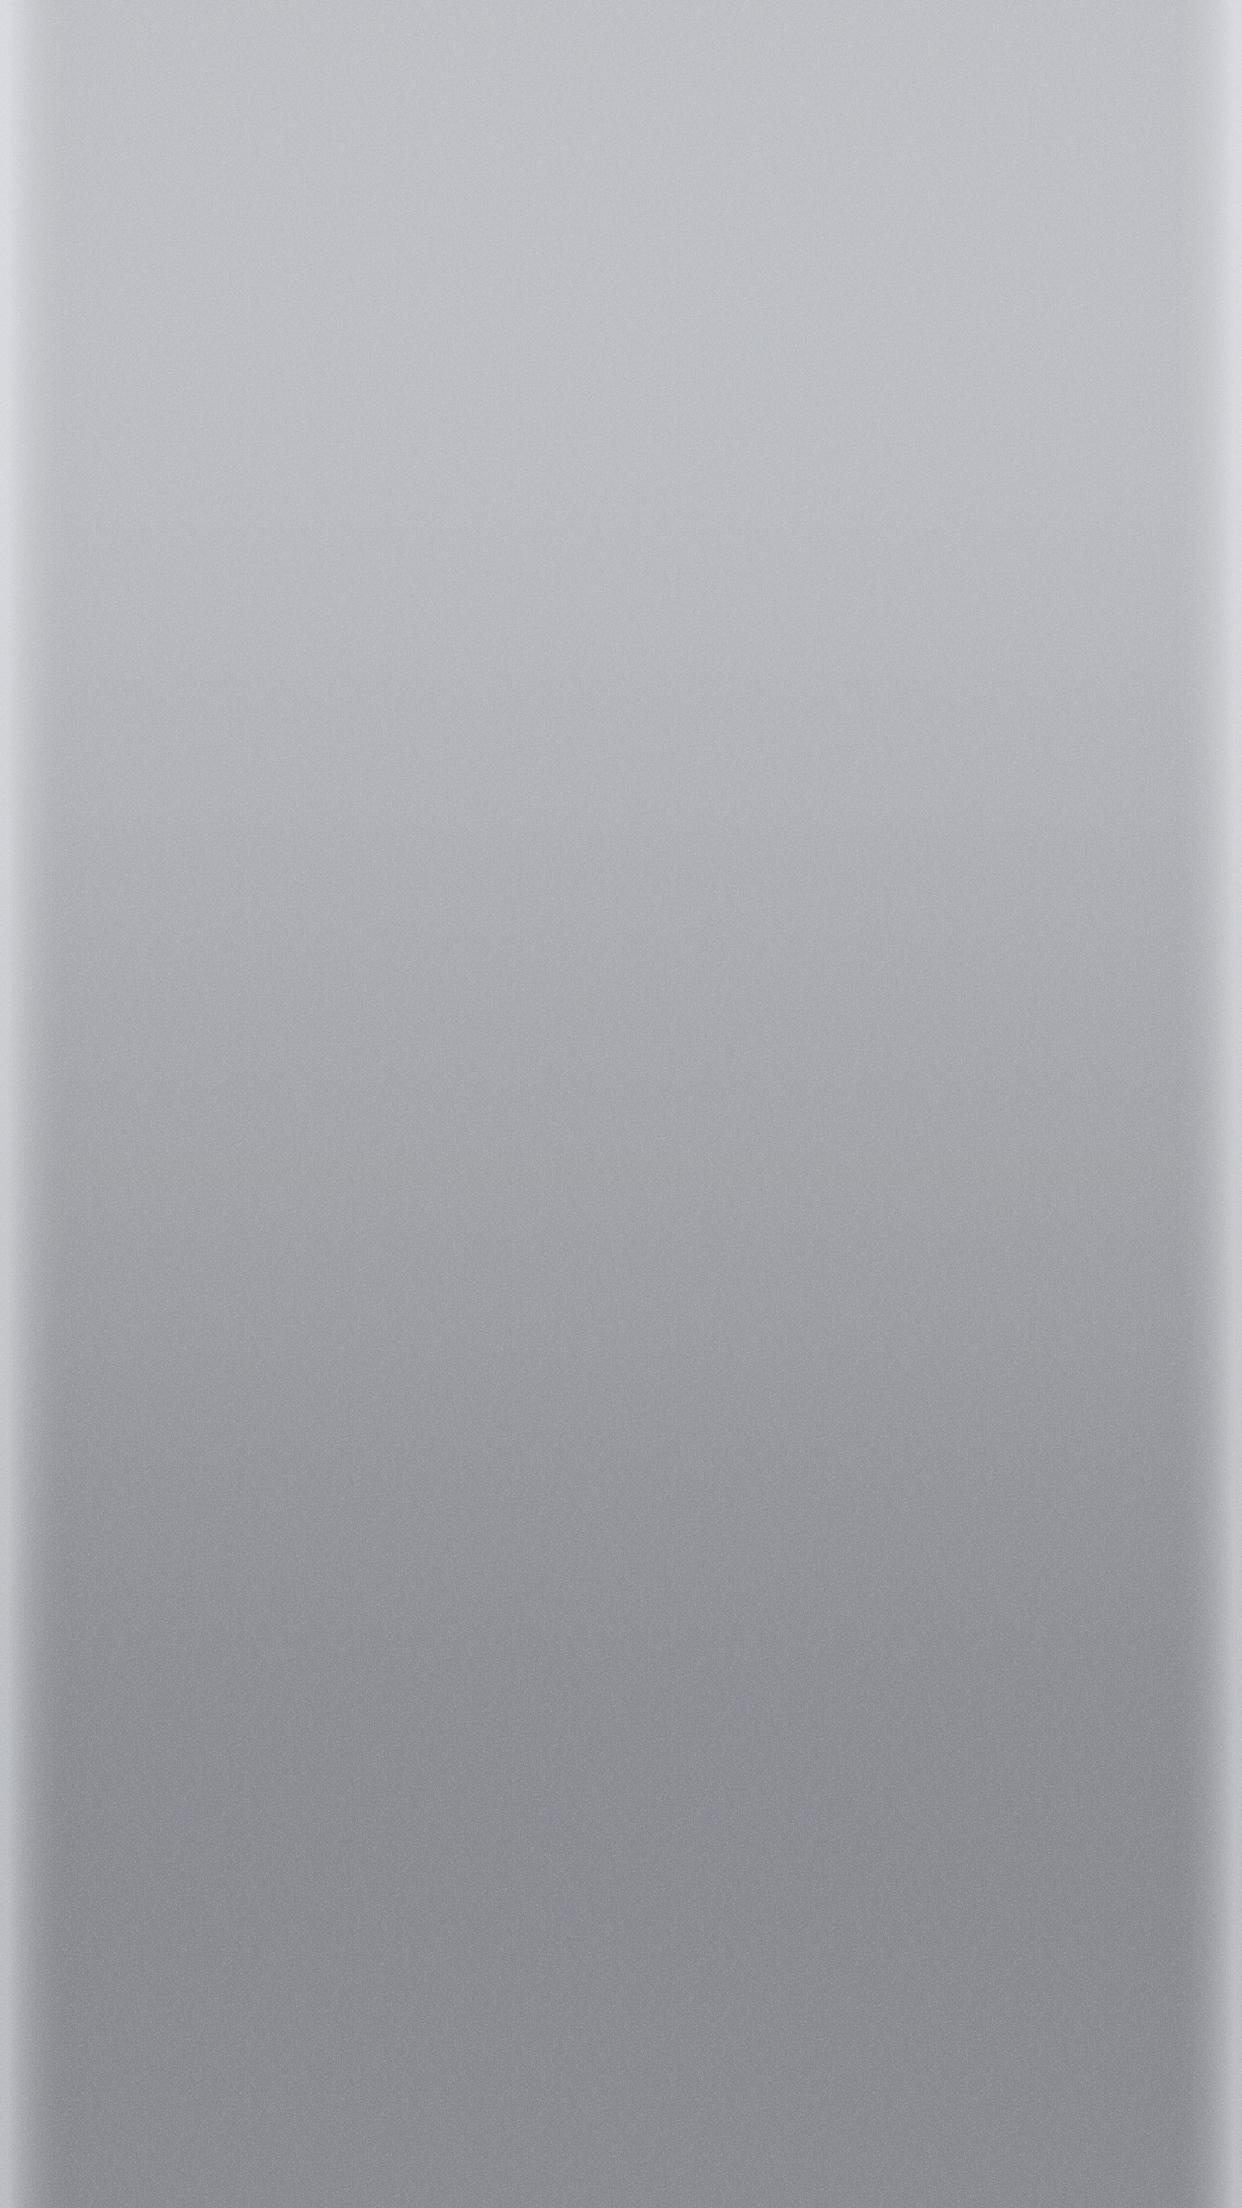 wallpaper.wiki-iPhone-7-Wallpaper-Grey-no-logo-